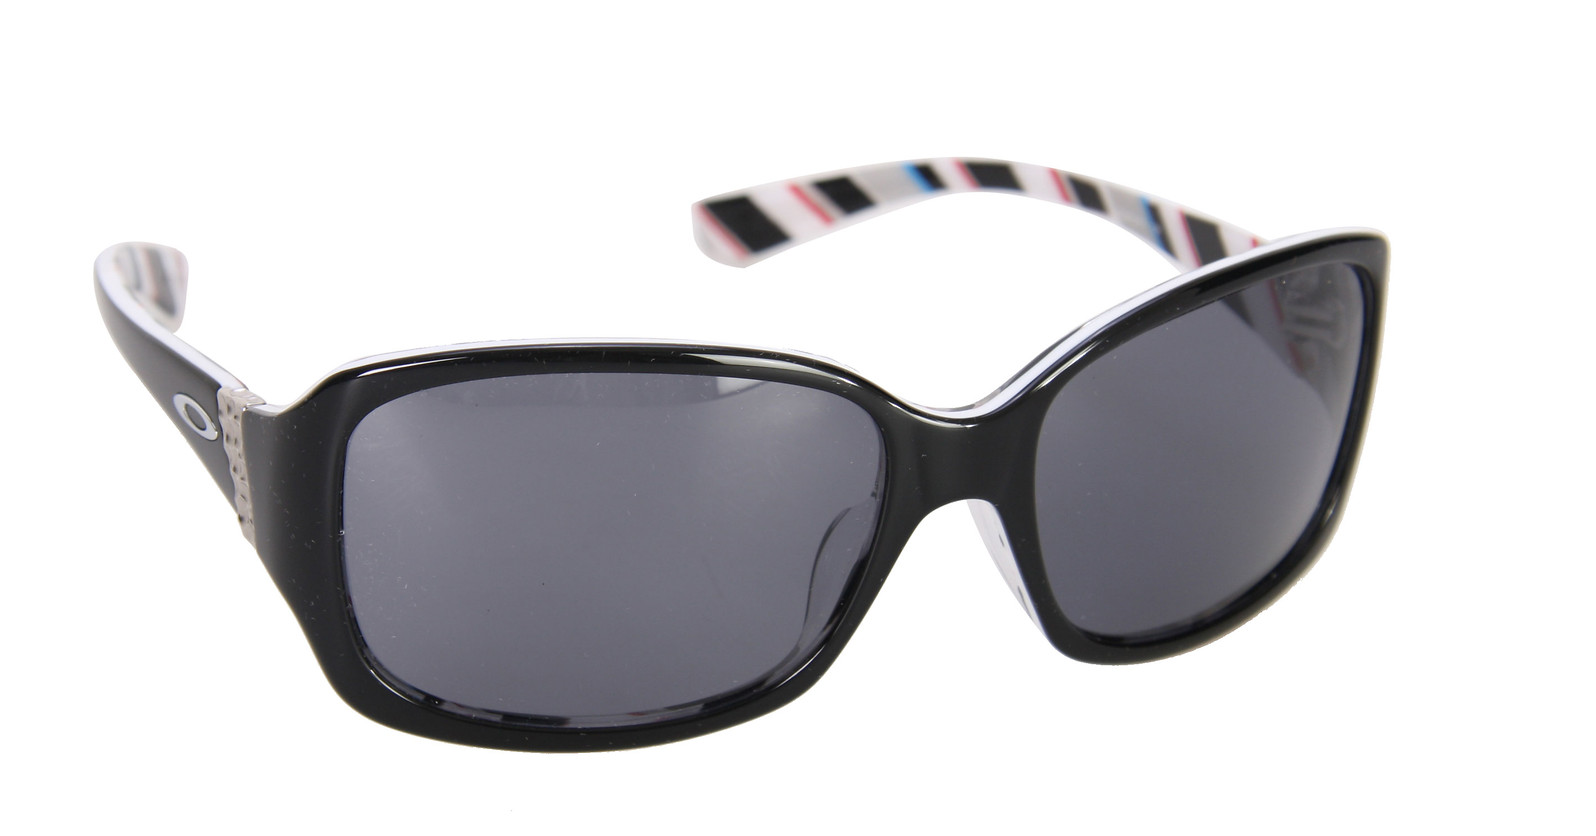 Oakley Discreet Sunglasses Black W/Stripes/Grey Lens  oakley-discreet-sngls-wmns-blkwstrpsgry-10.jpg